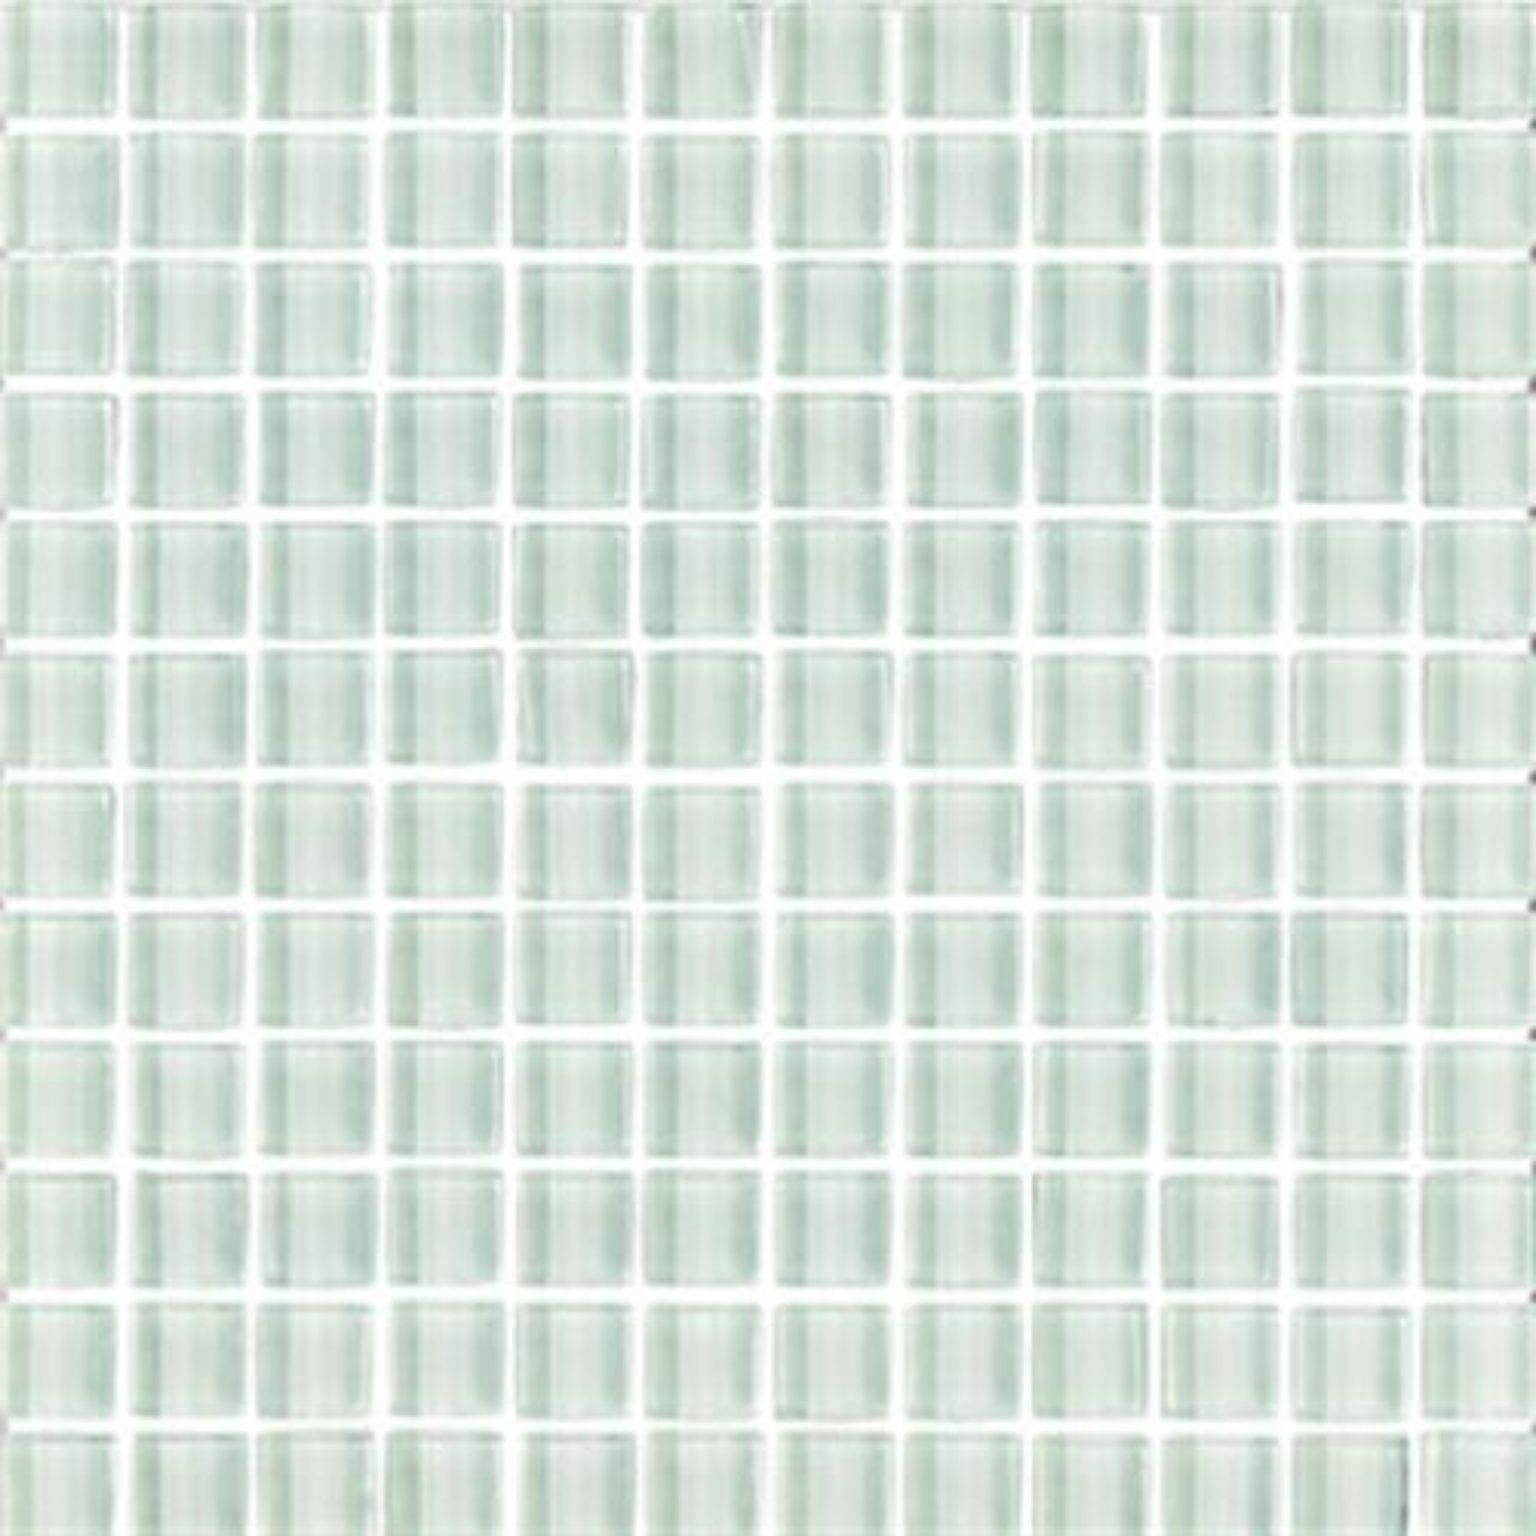 Interglass Shimmer Snowdrift Brilliant Interceramic Usa Ceramic Mosaic Tile Flooring Best Floor Tiles